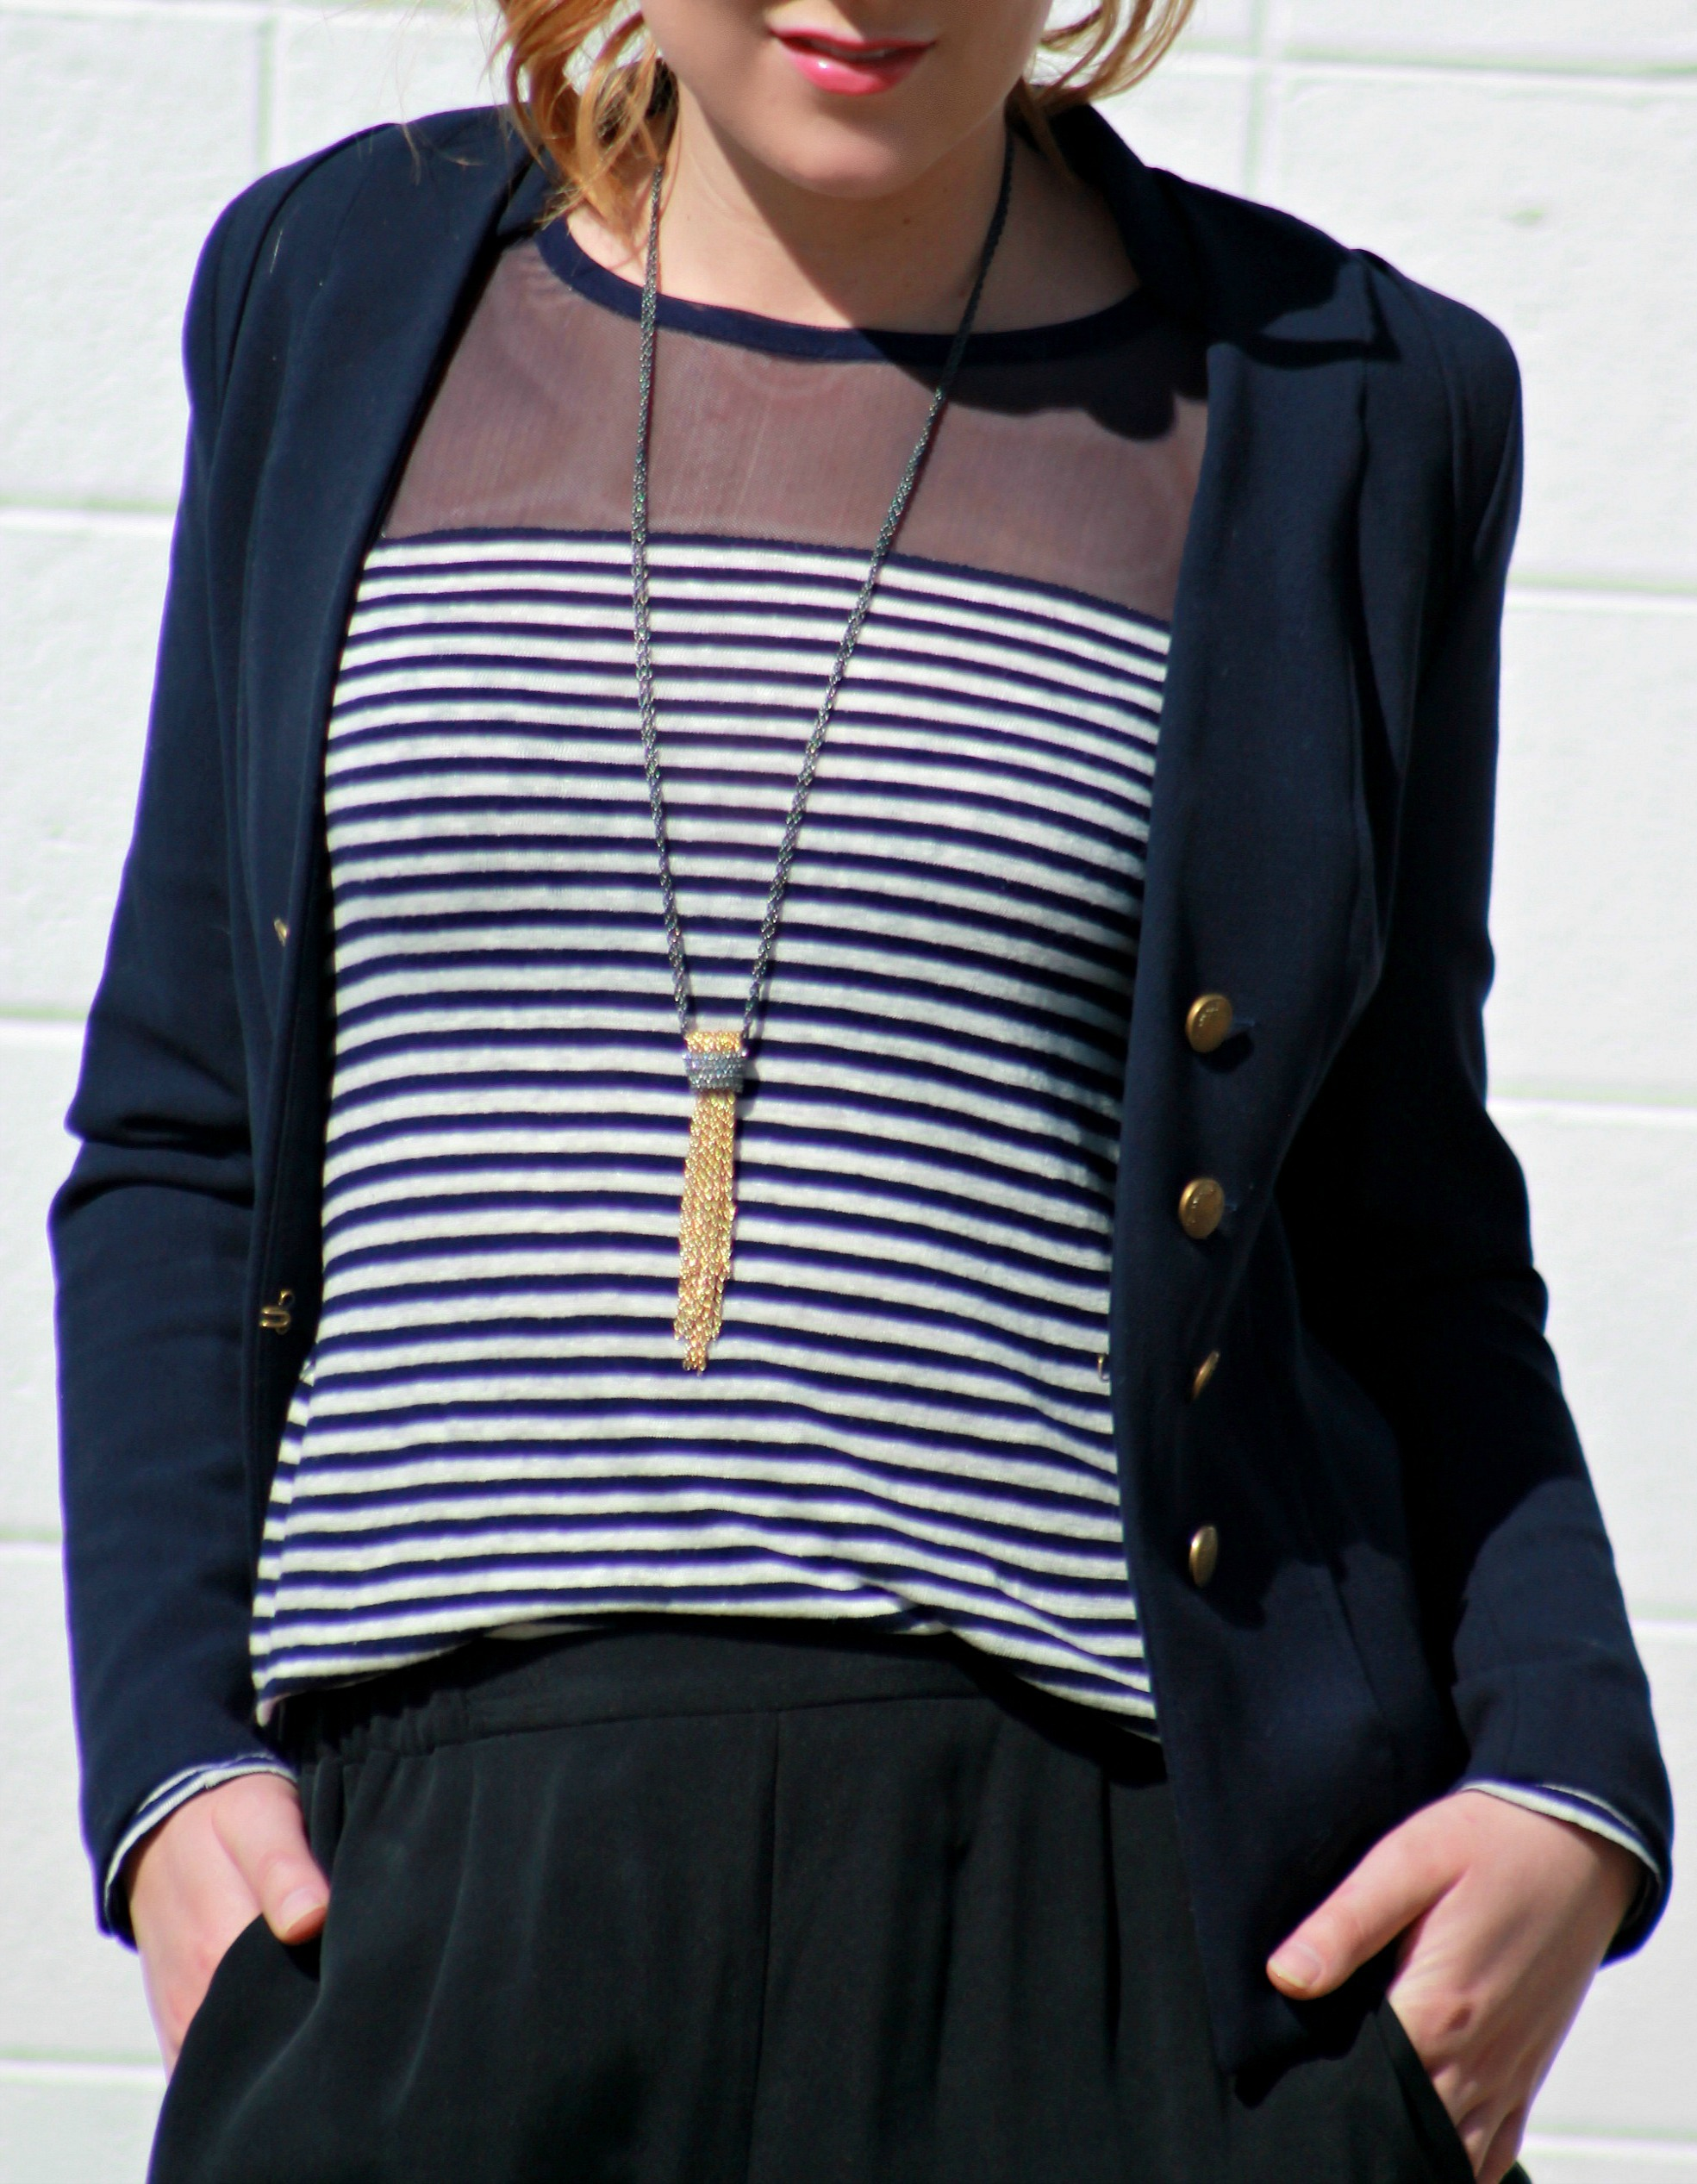 Navy Striped Mesh Shirt + Navy Blazer + Tassel Necklace